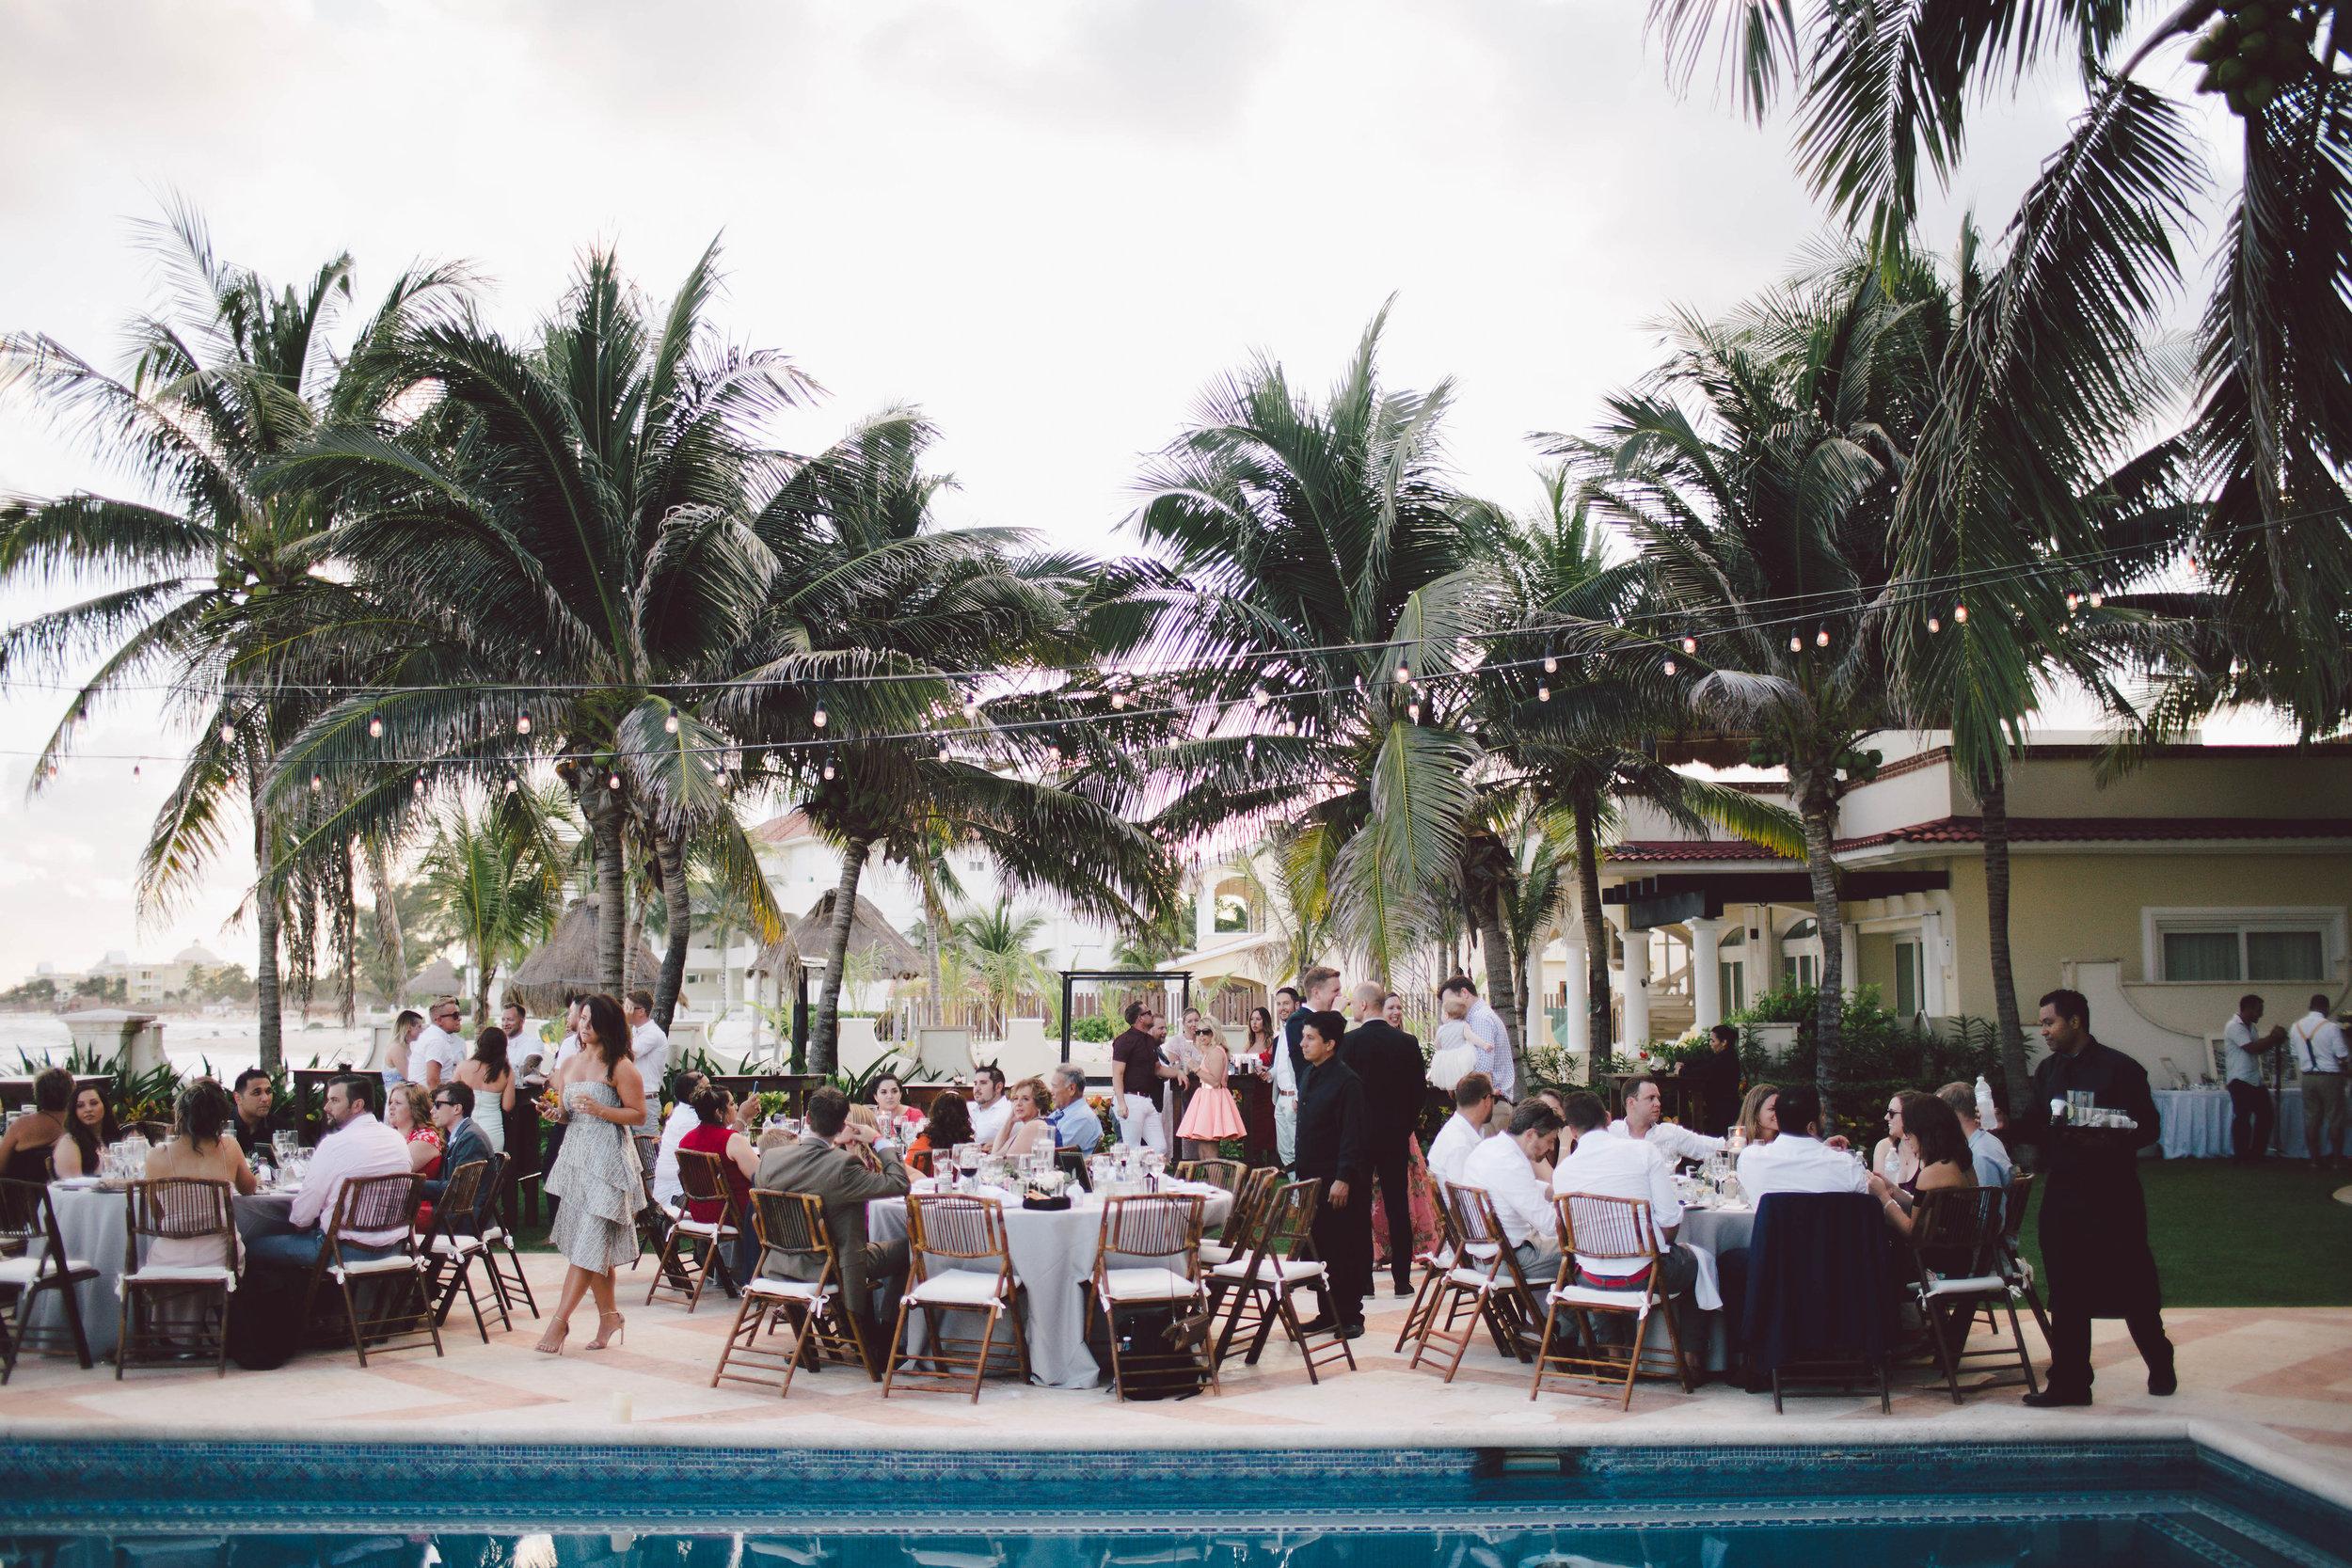 mexico_wedding_cancun_villa_la_joya_evangeline_lane_113.jpg